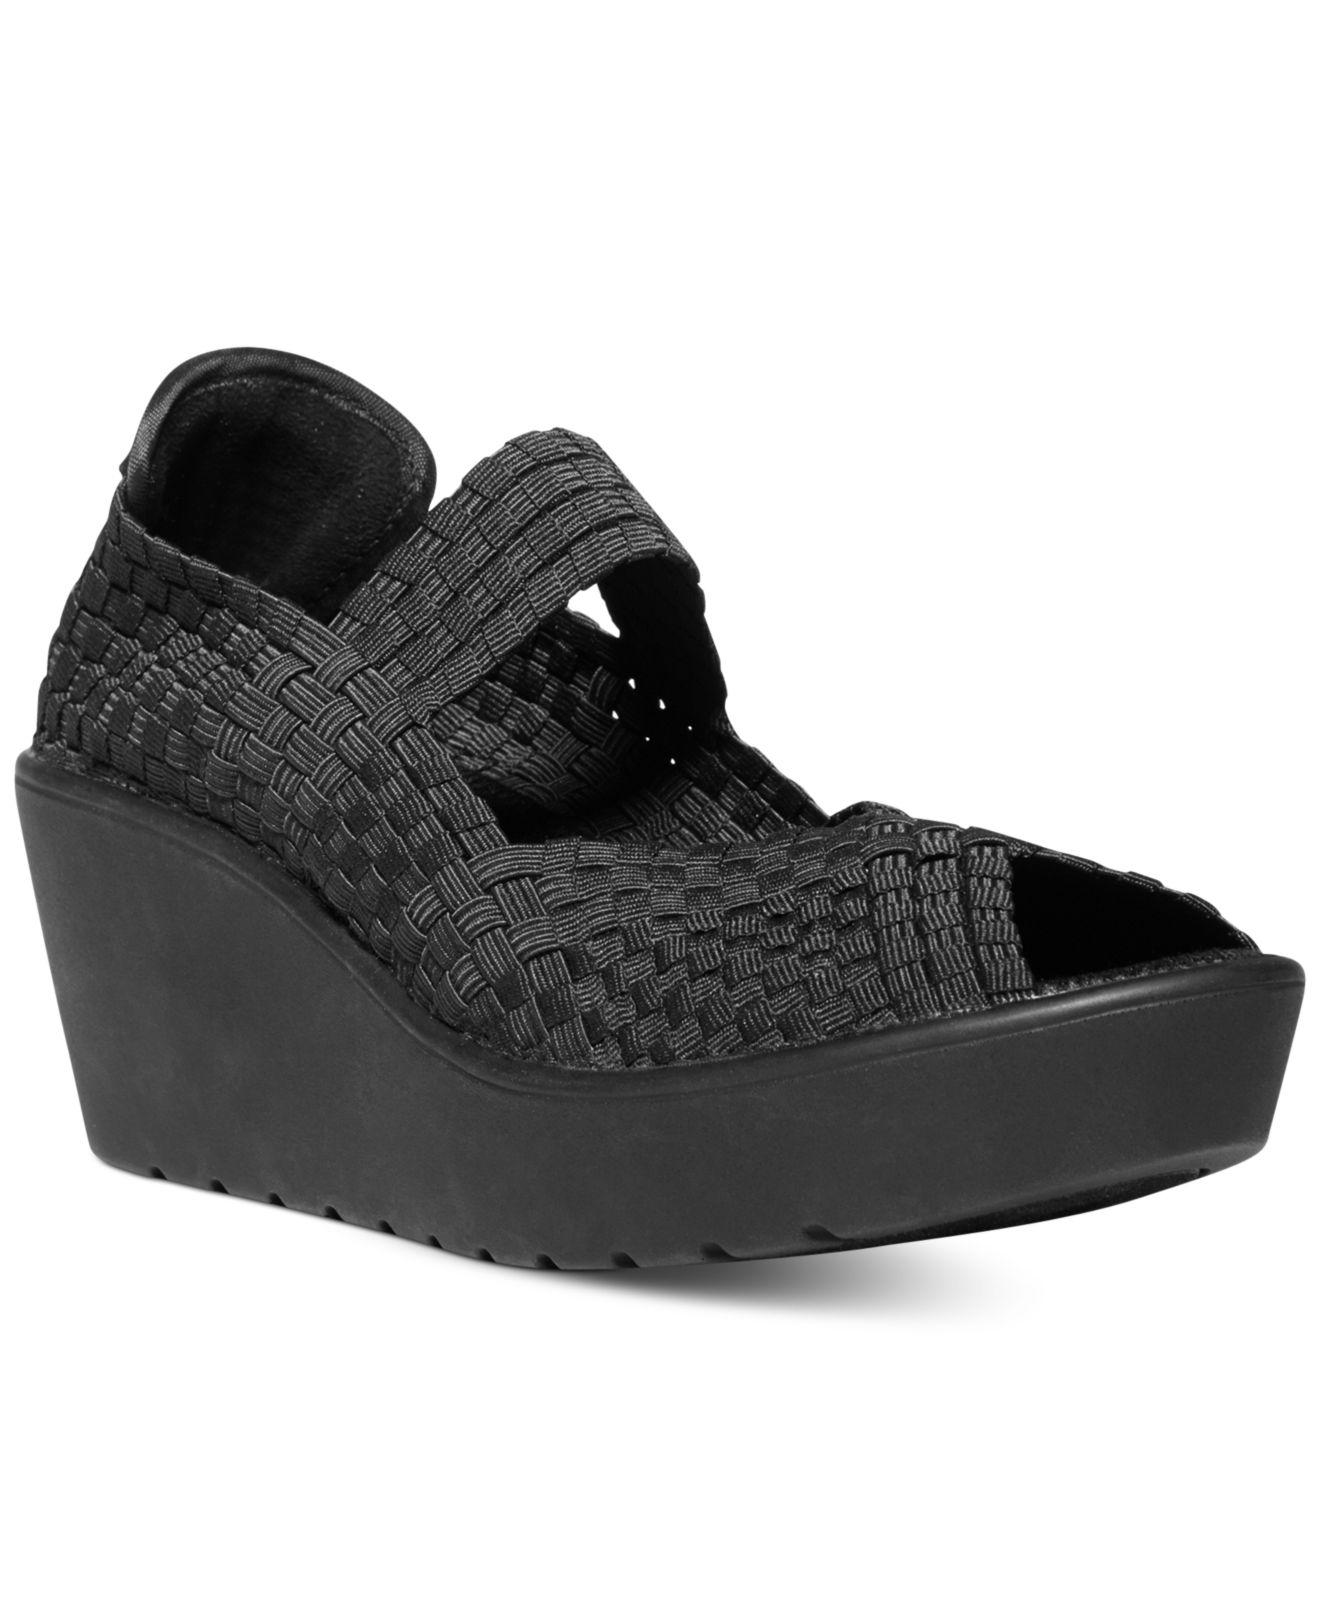 Lyst Steven By Steve Madden Brynn Platform Sandals In Black